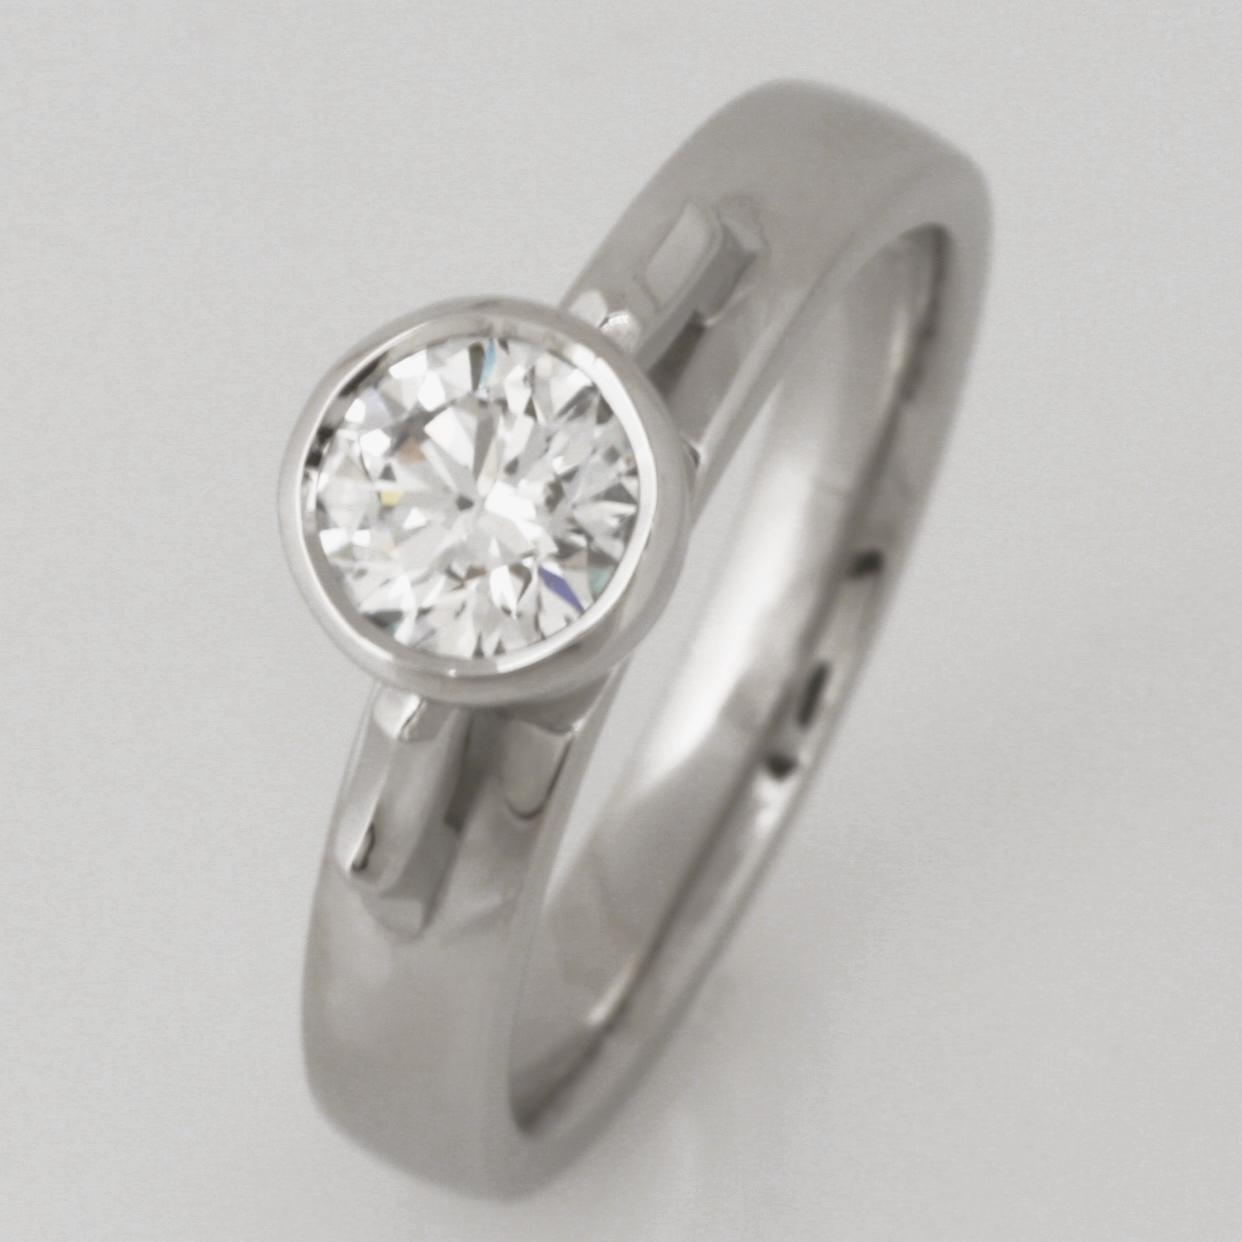 Handmade ladies palladium engagement ring featuring an Australian Argyle white diamond